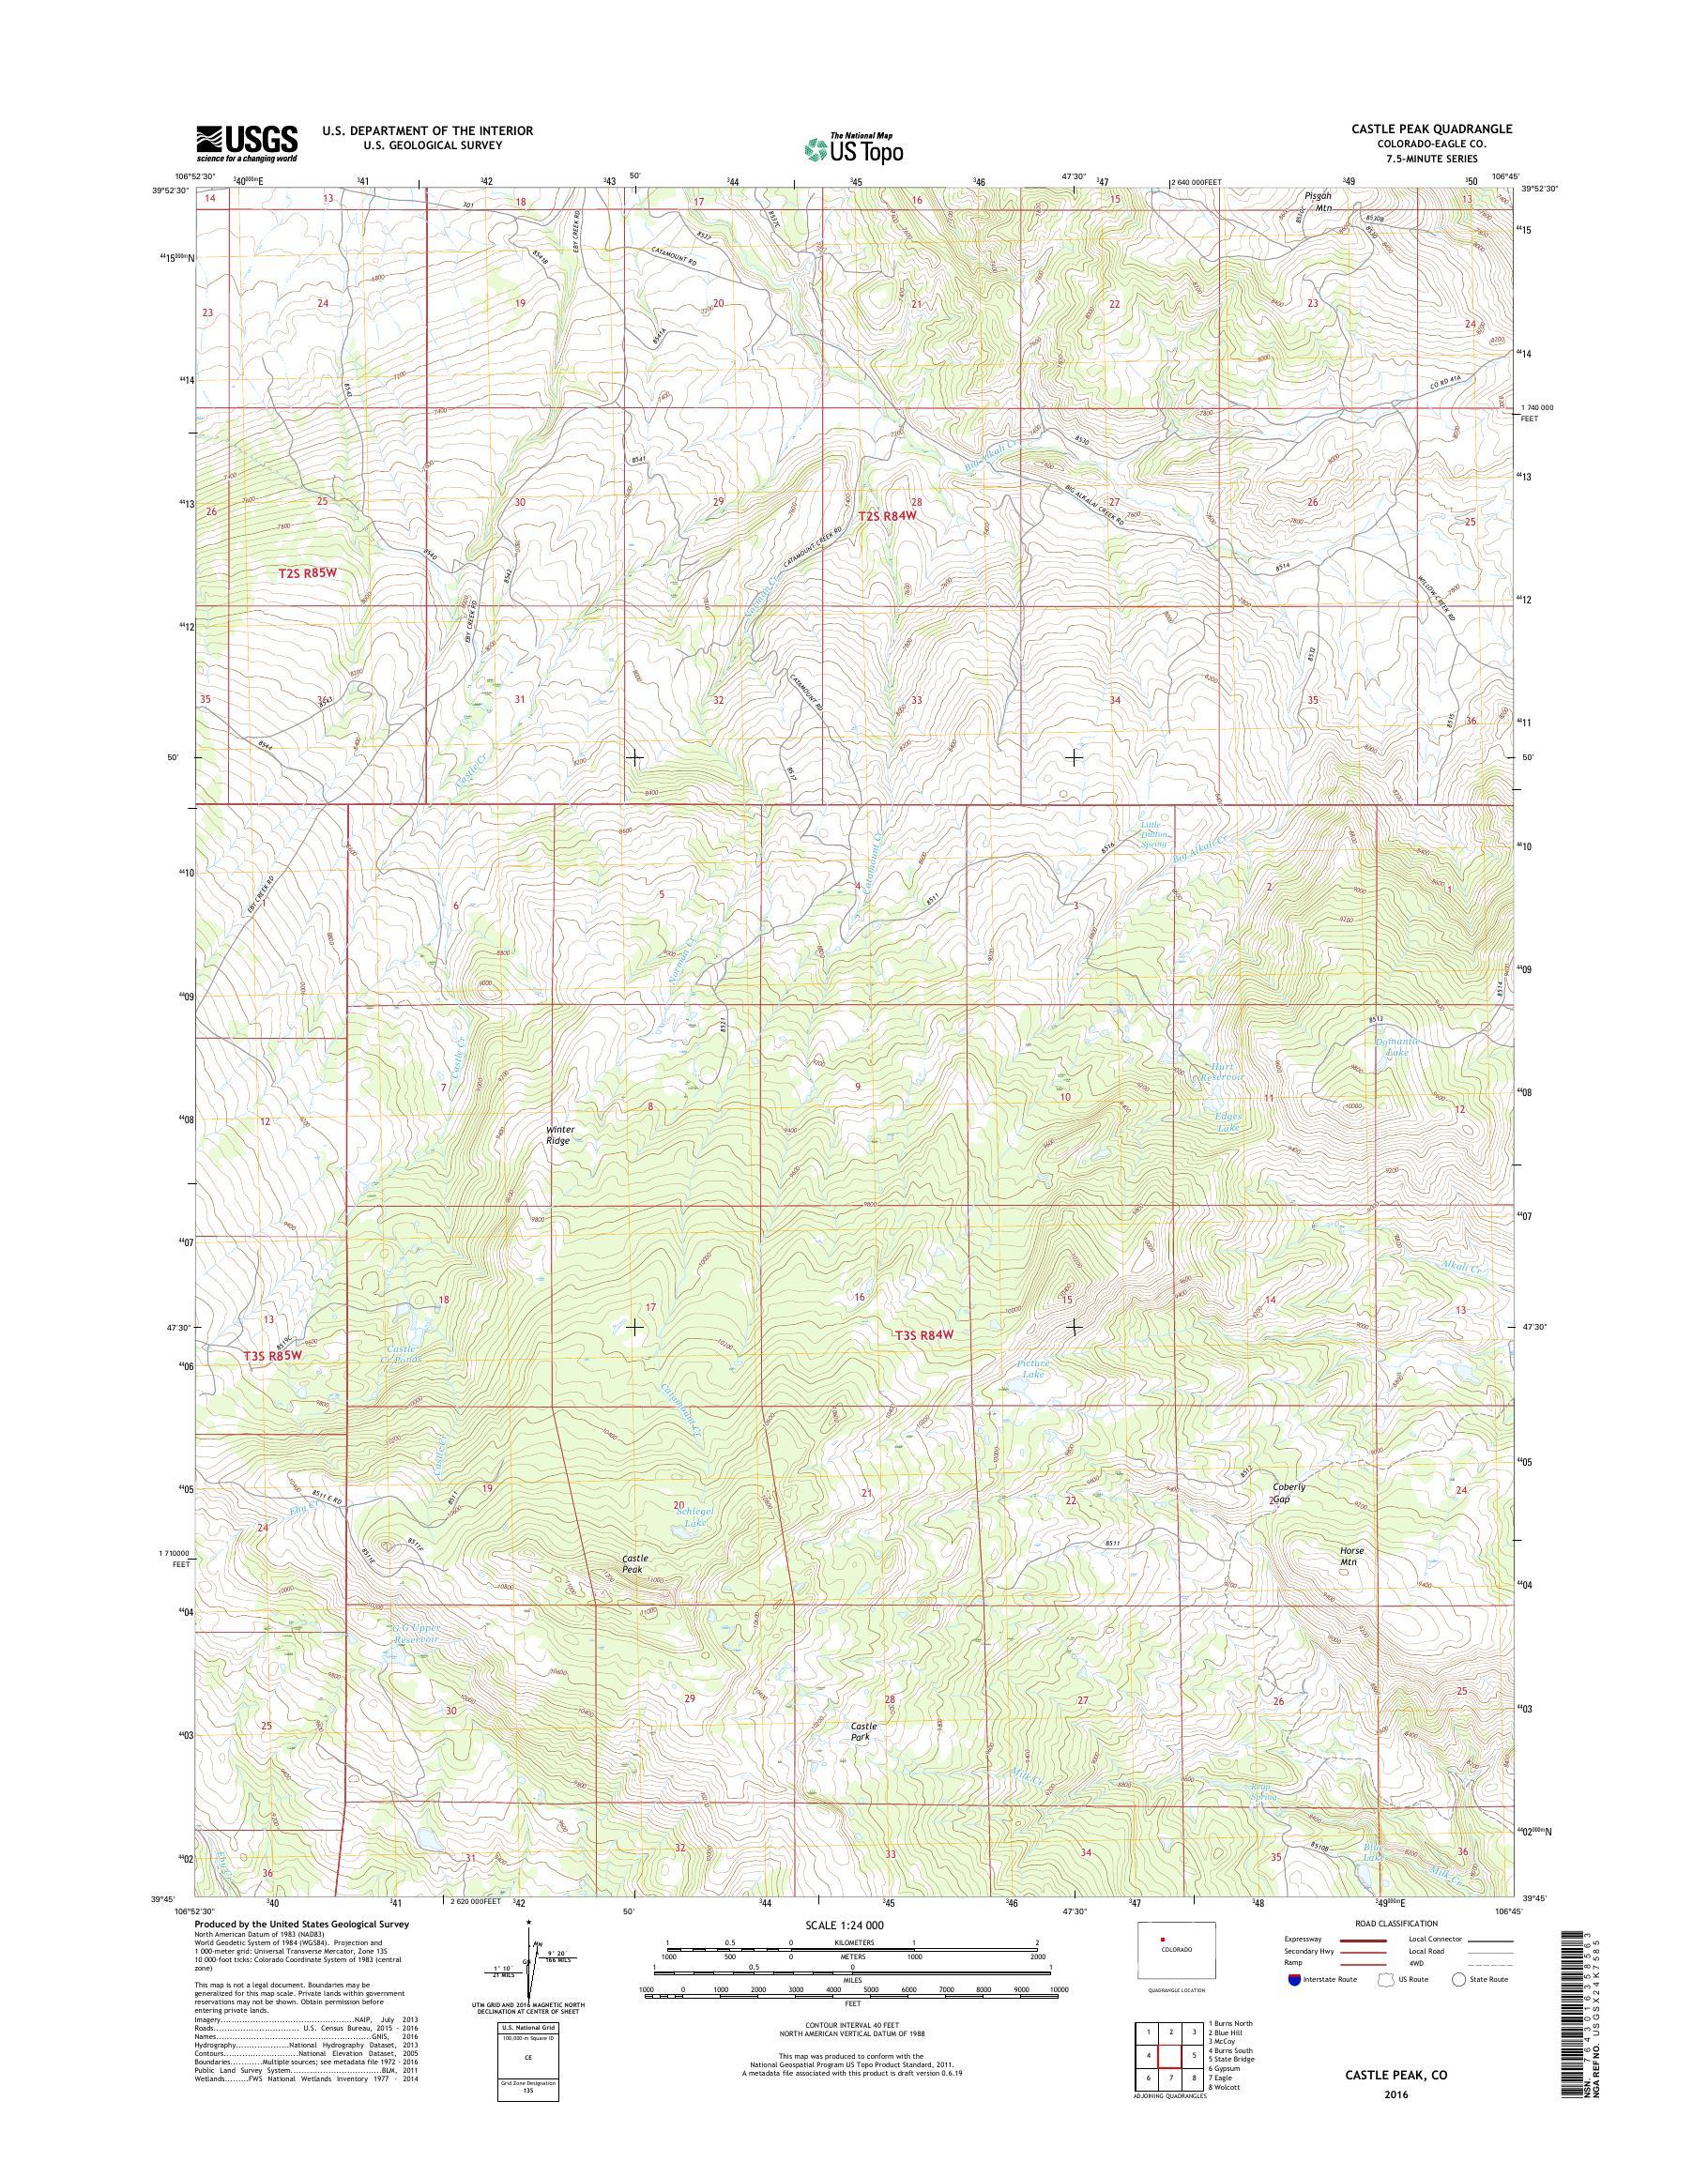 MyTopo Castle Peak, Colorado USGS Quad Topo Map on